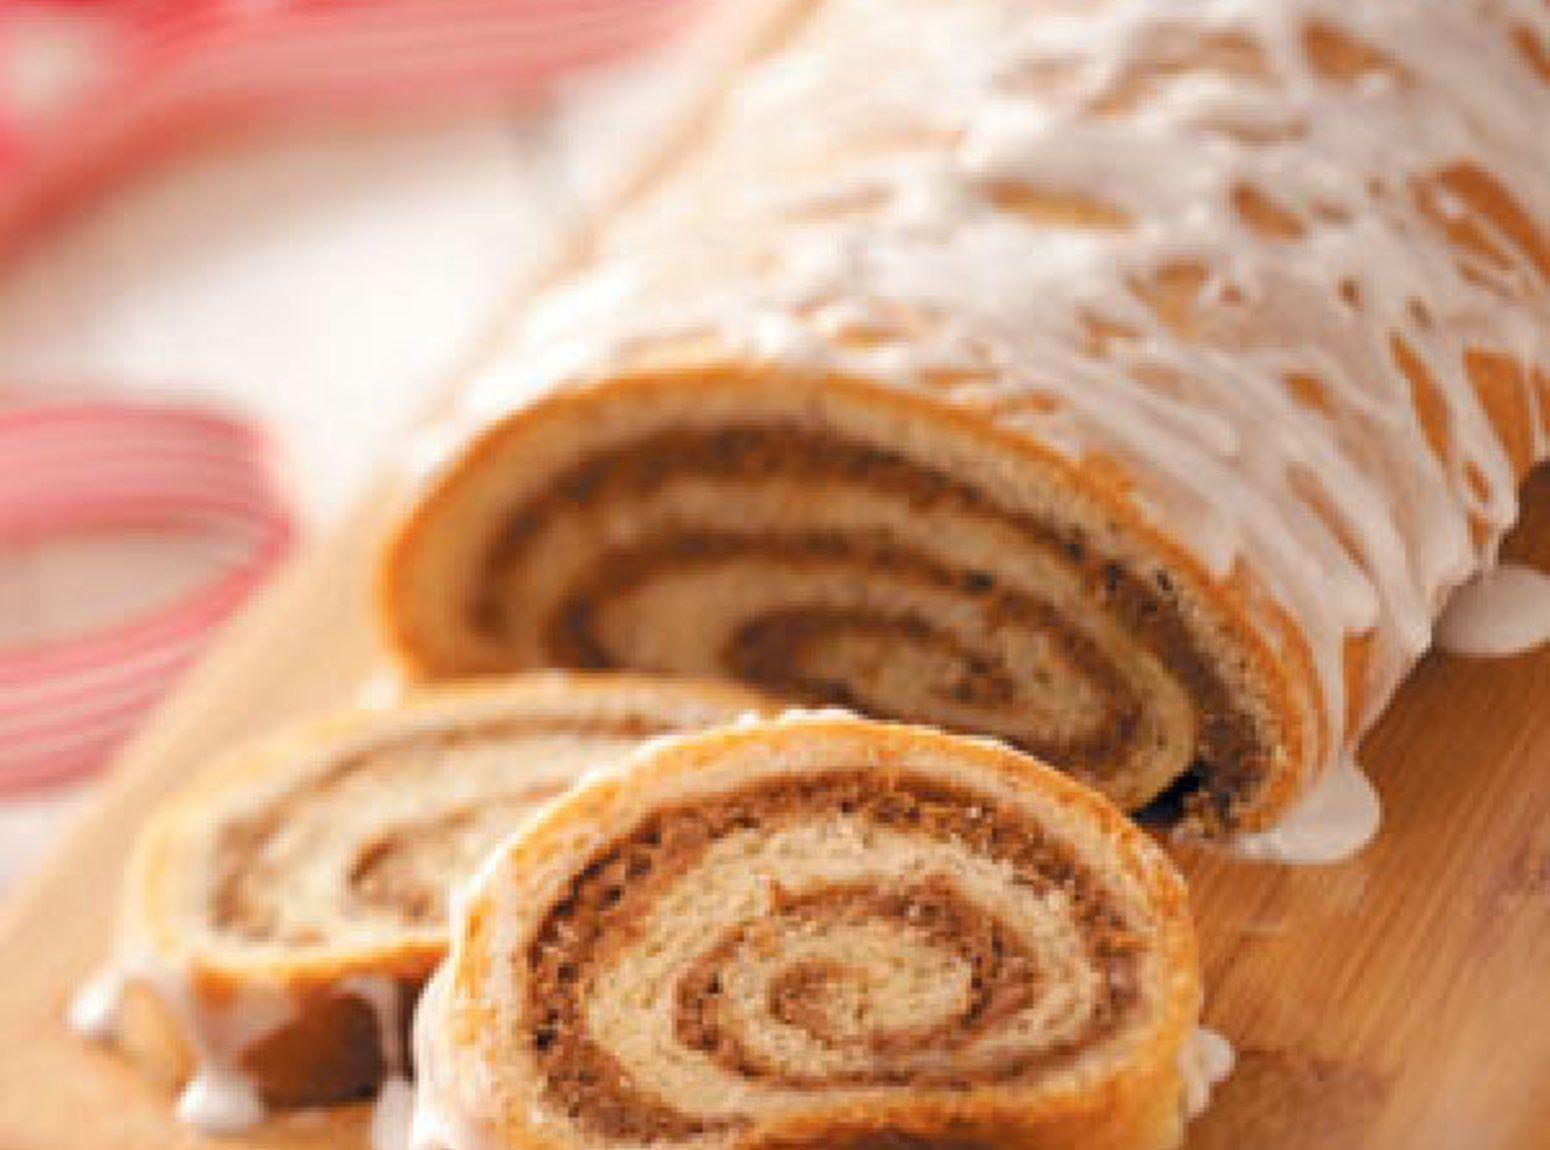 Nut Roll Buy Homemade Kolachi, Kolache, Povitica, Potica Old fashioned nut roll